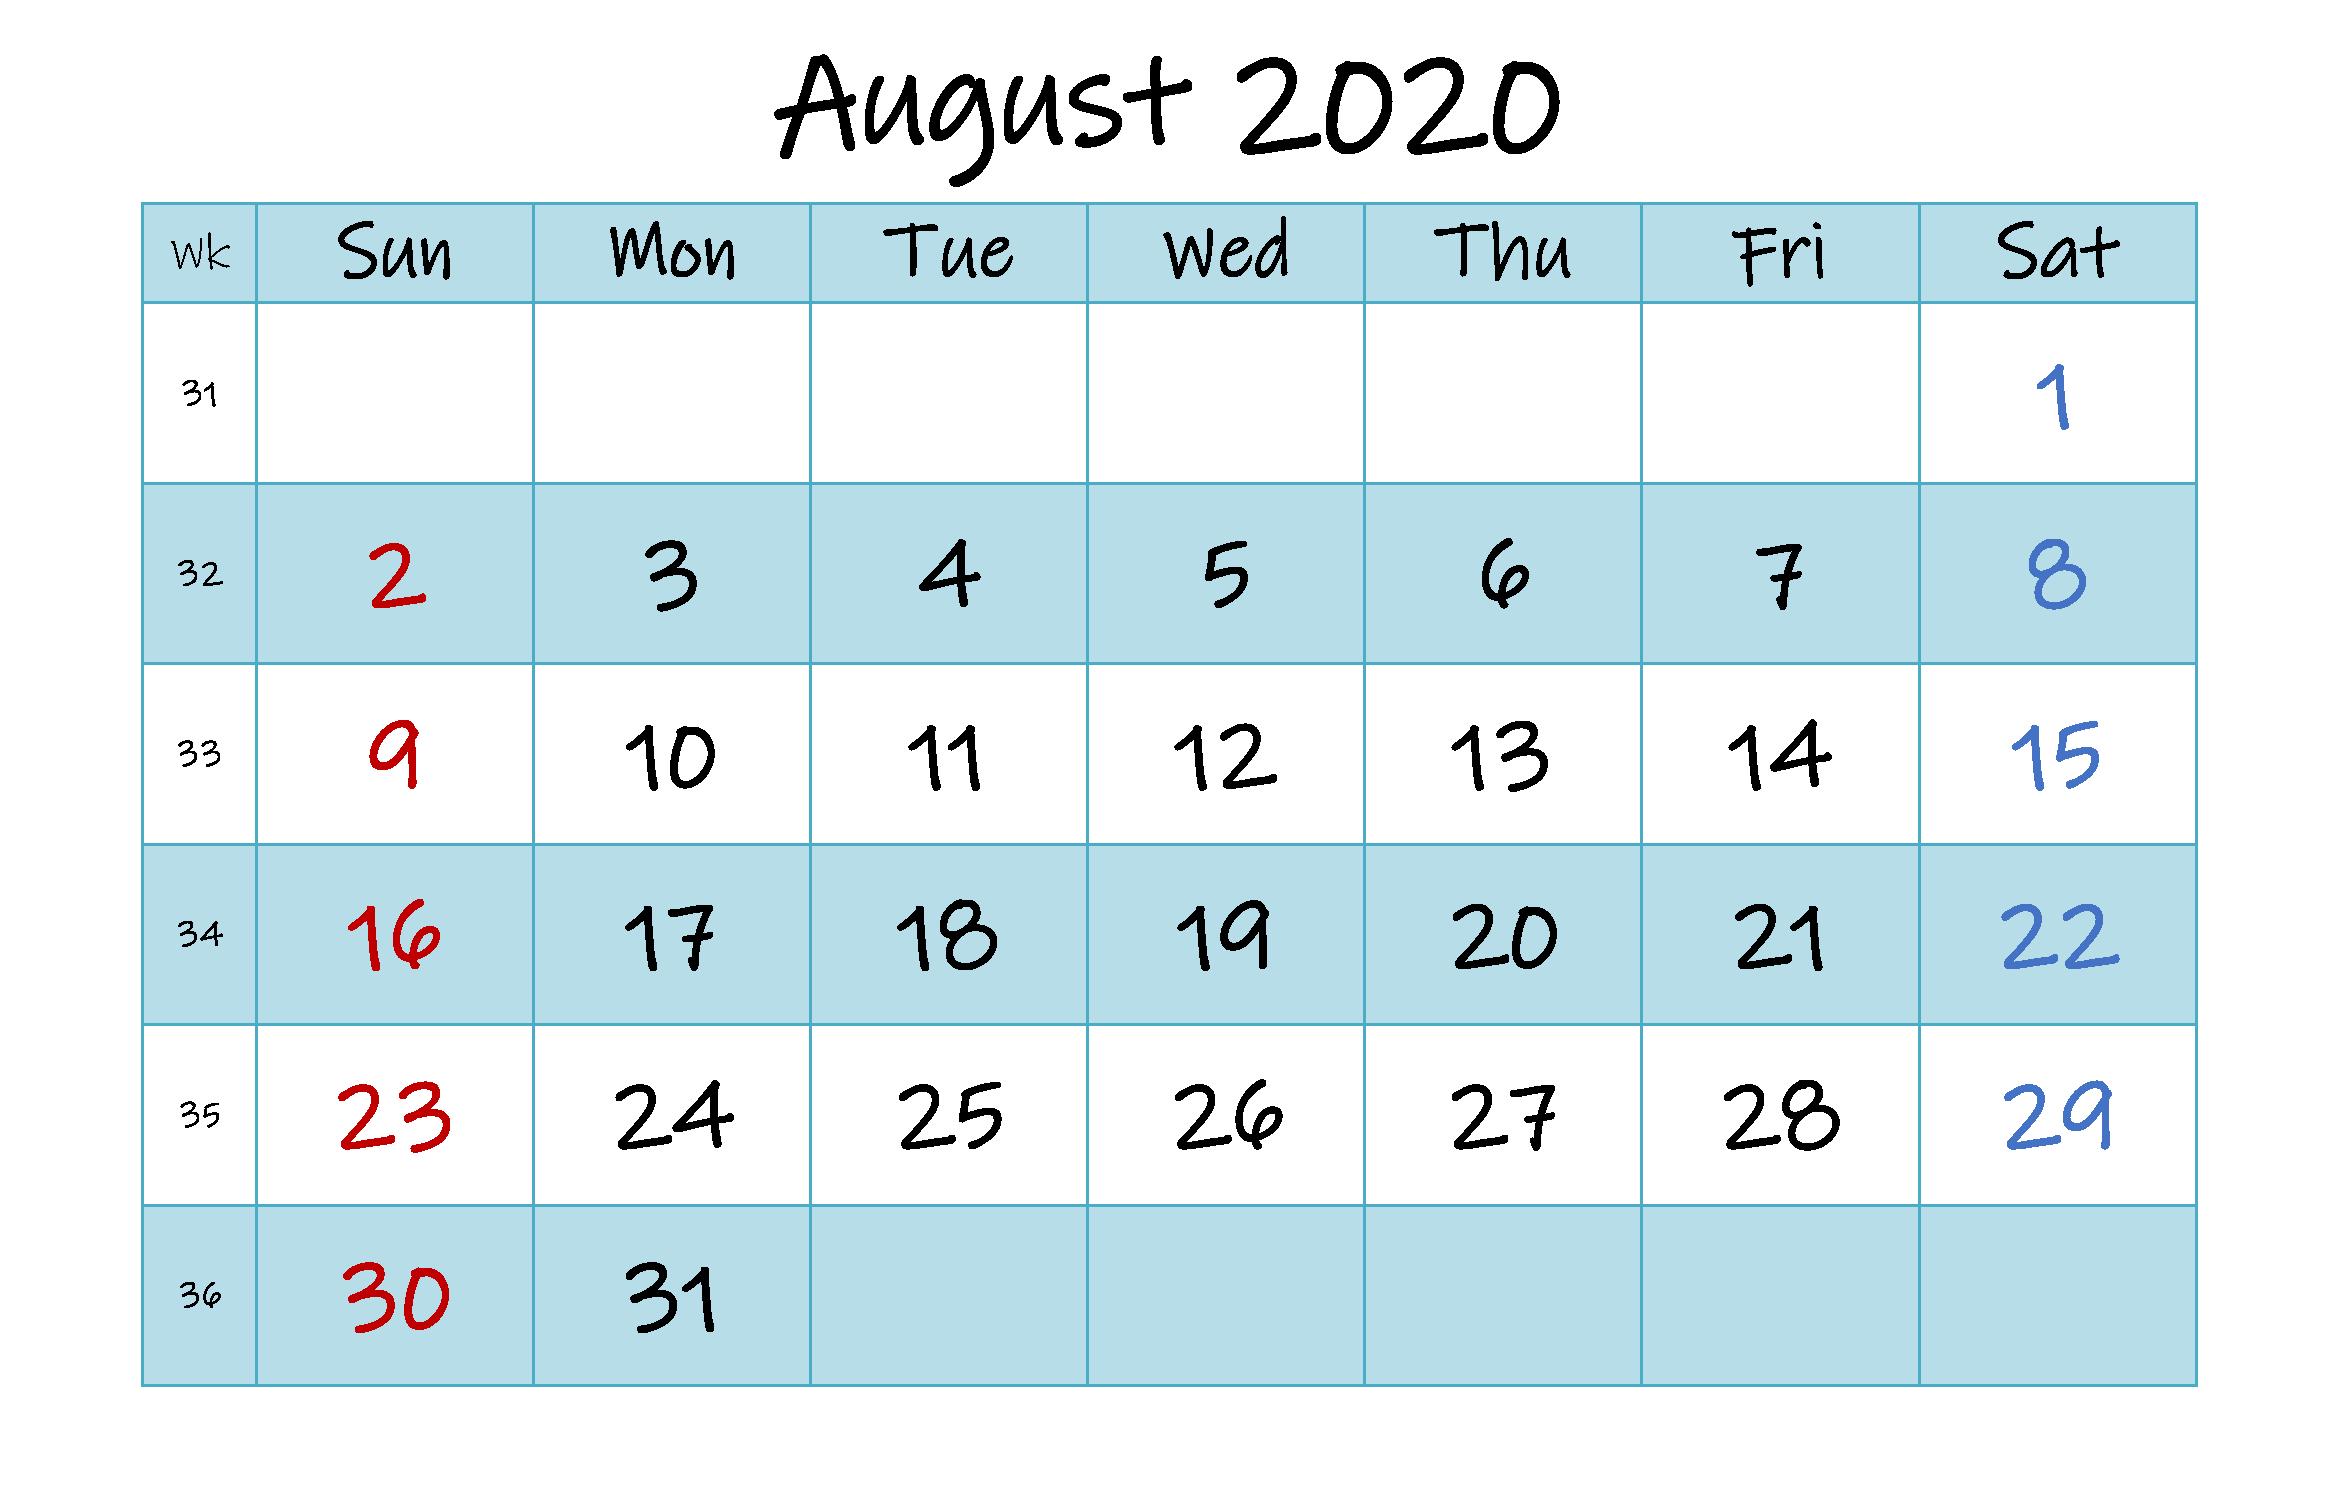 Monthly Calendar Template August 2020